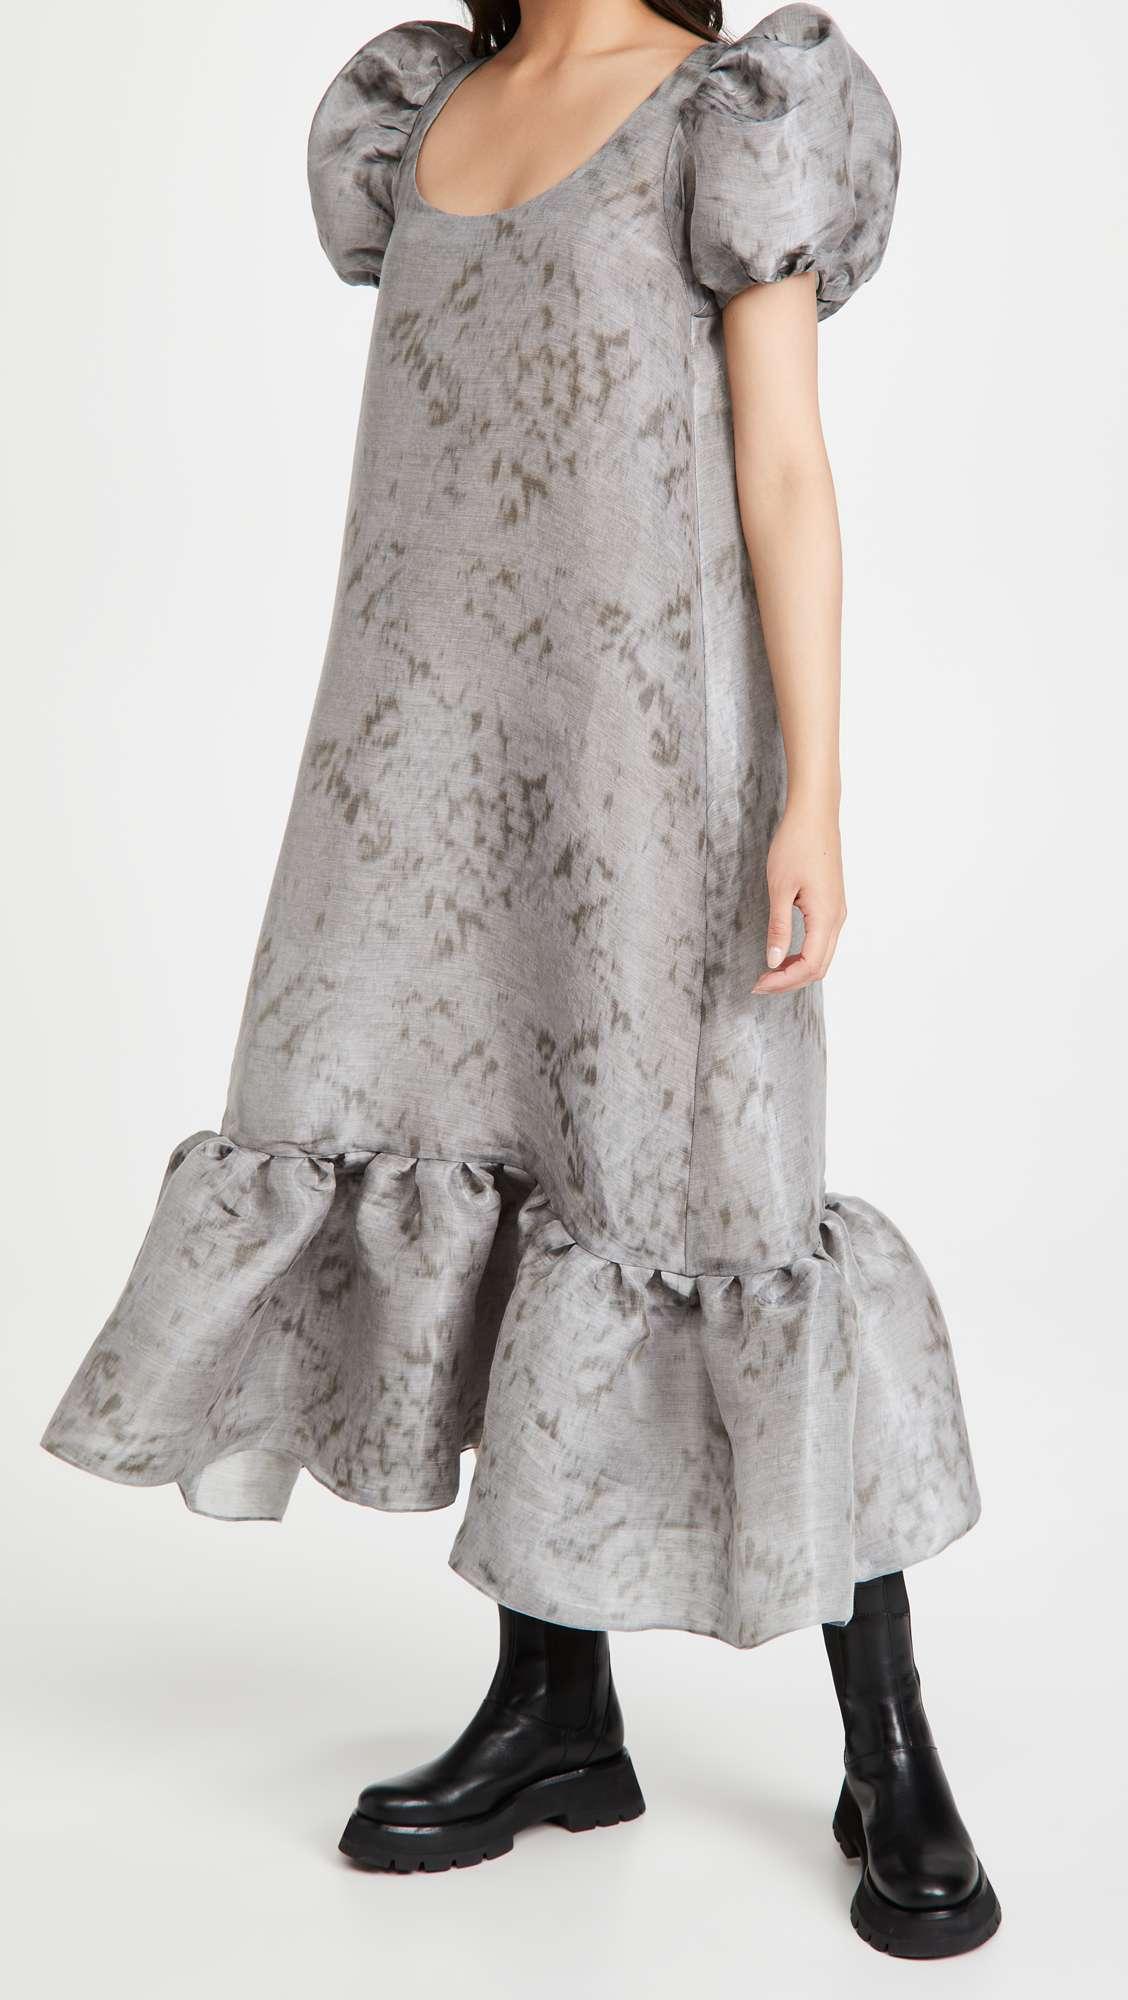 Kika Vargas Nella Dress $575 (originally $1,150)